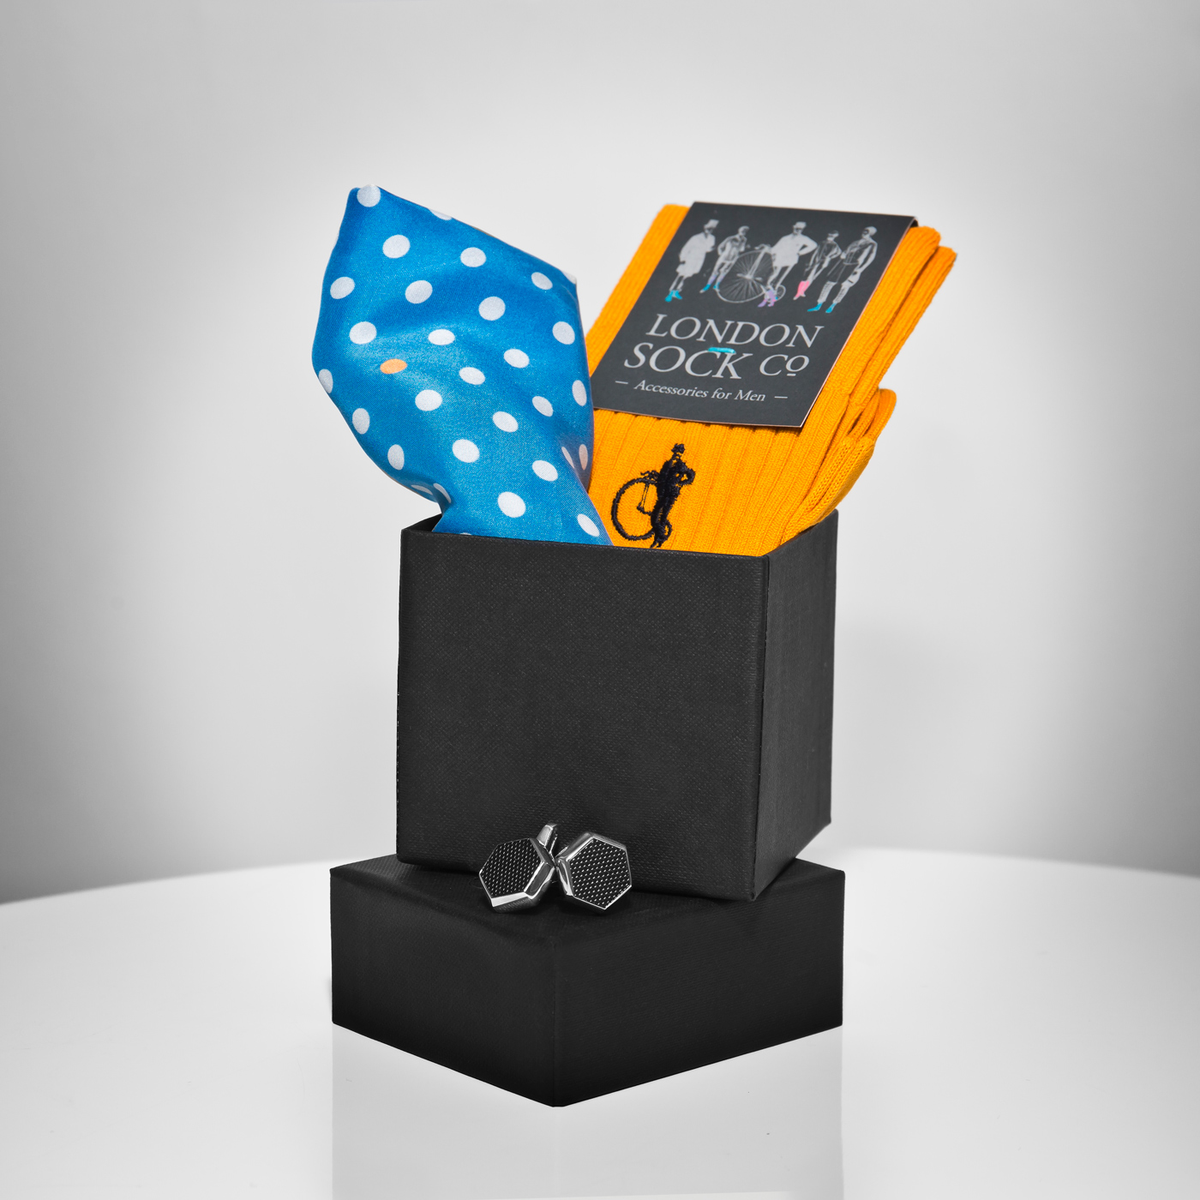 Win a @TheoryOfStyle man box inc. @LondonSockCo socks, @PinCollarShirts pocket sq & our cufflinks RT & follow to win. http://t.co/xaKuj3F2Hb